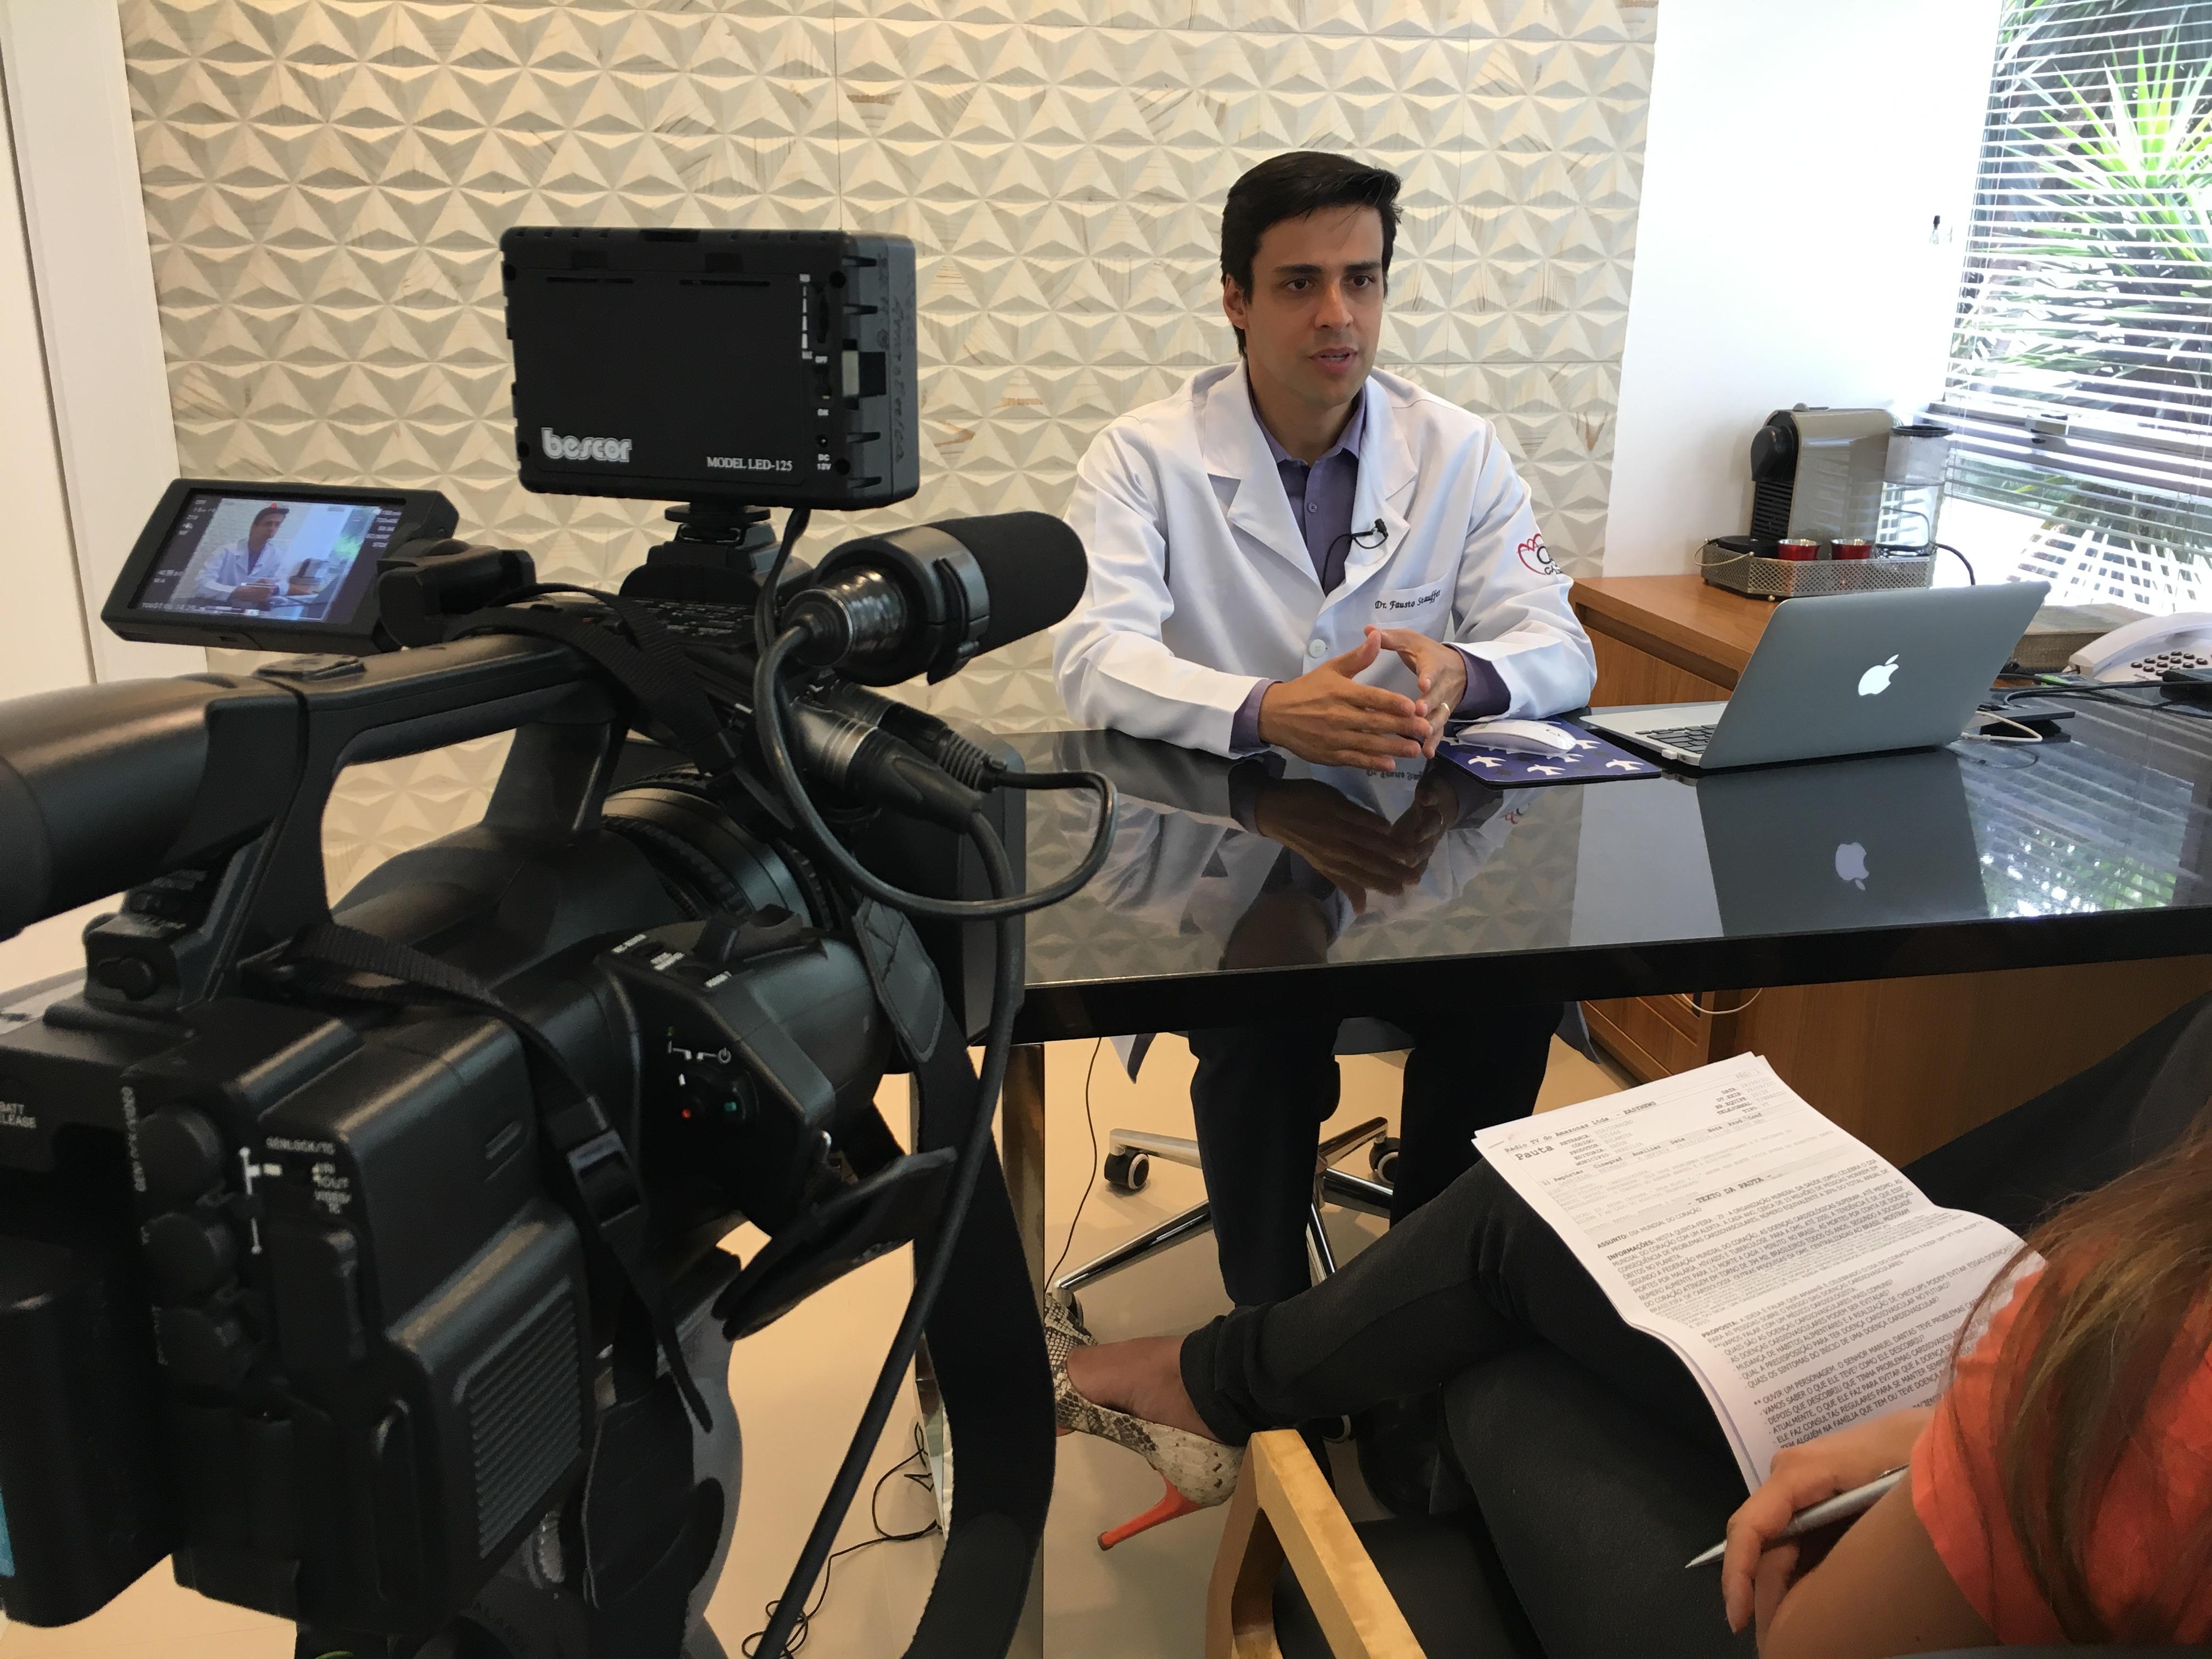 tv-globo-norte-rede-amazonica-dr-fausto-stauffer-hsl-27-09-2016